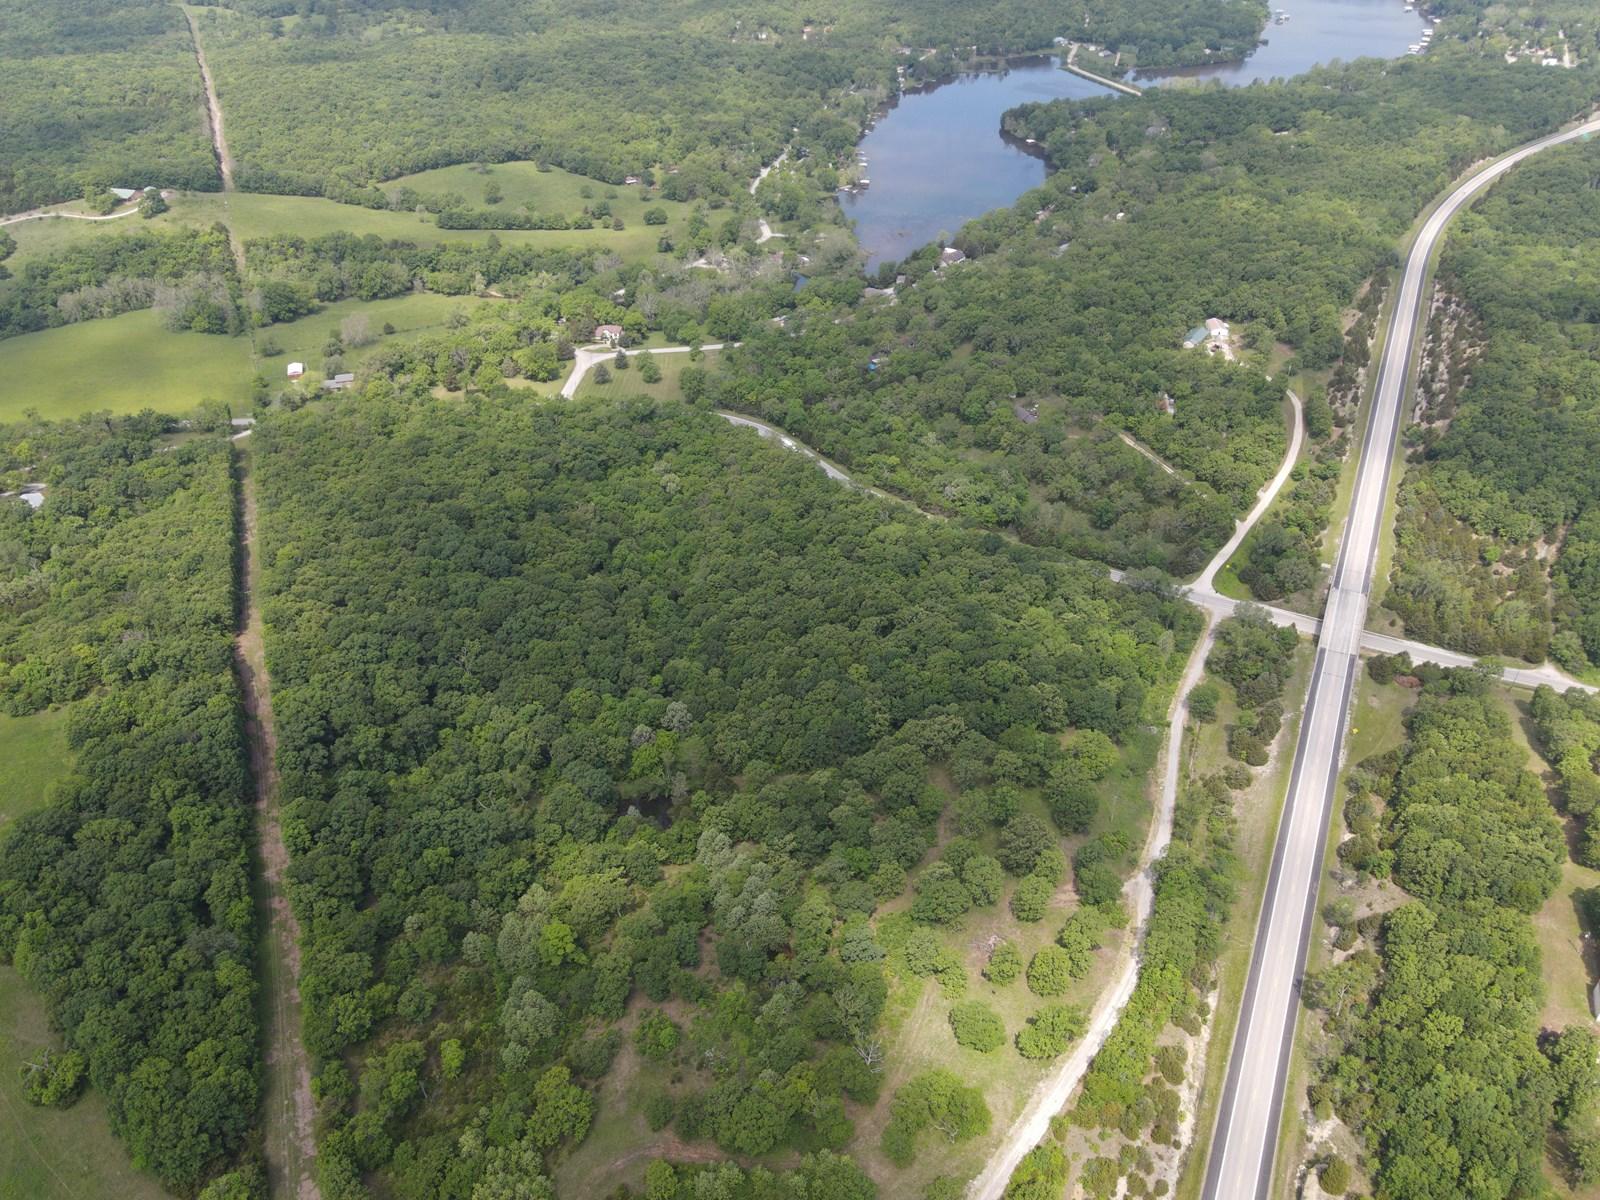 Land for sale Warsaw MO Benton County